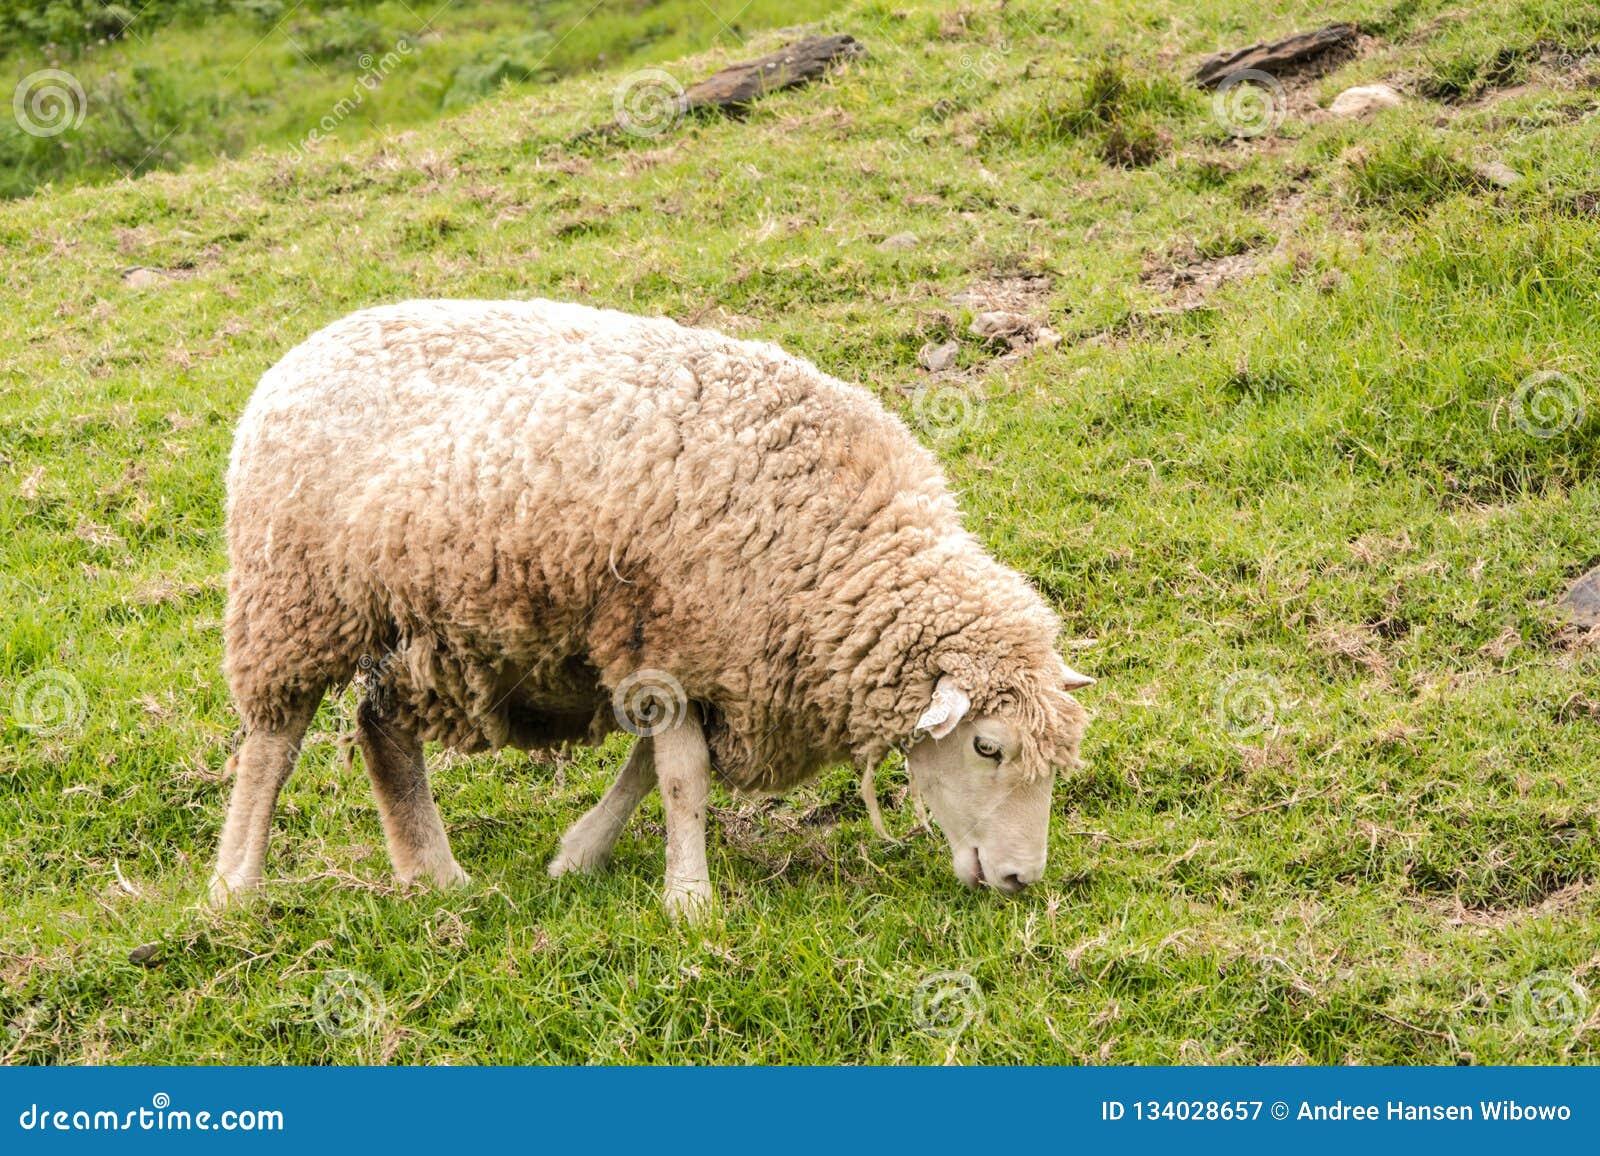 Dirty Sheep Grazing on a Grassy Hillside